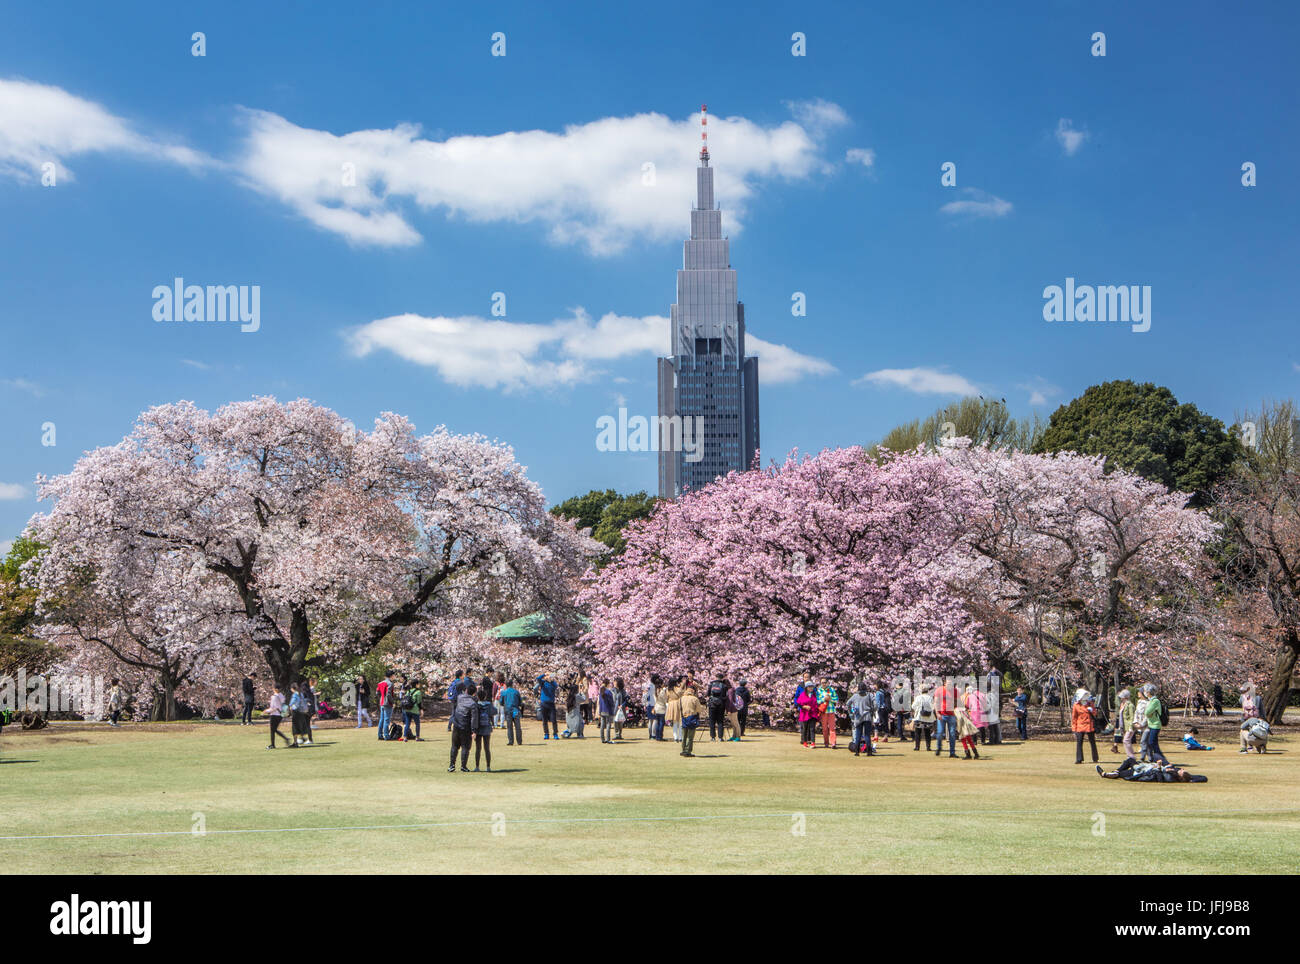 Japan, Tokyo City, Shinjuku District, Shinjuku Gyoen-Park, Cherry Blossoms, - Stock Image